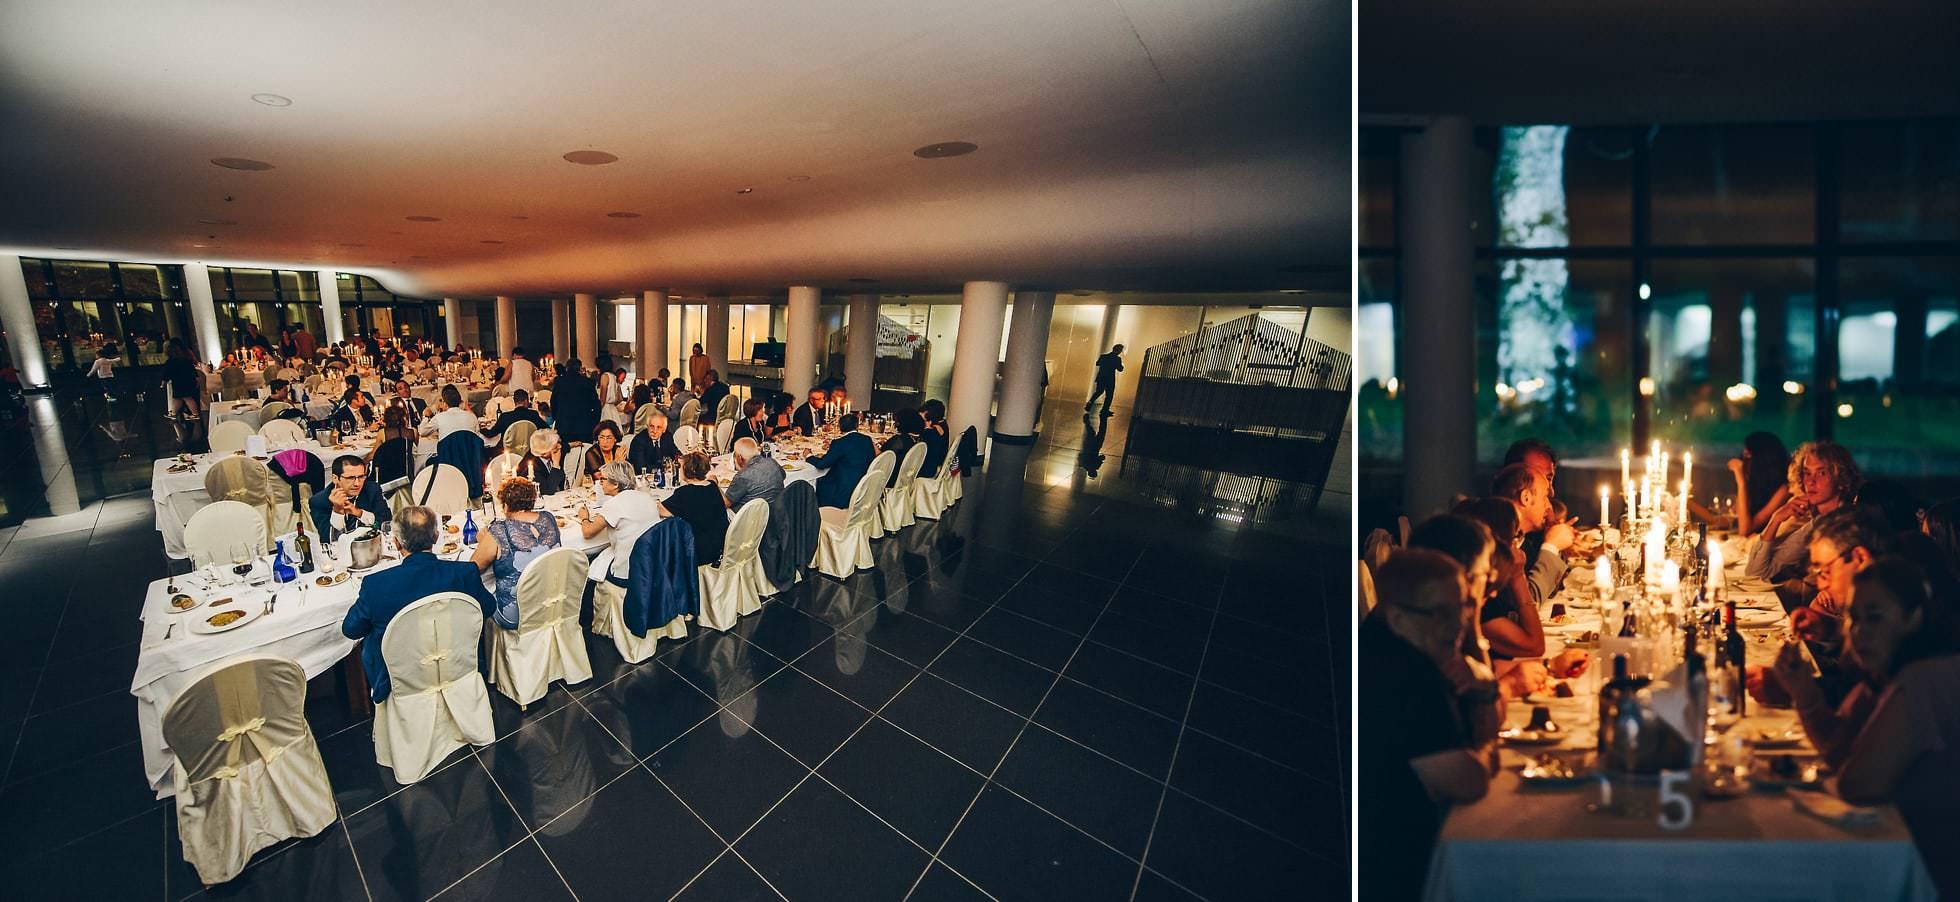 12 fotorgrafo matrimonio hotel giubileo potenza